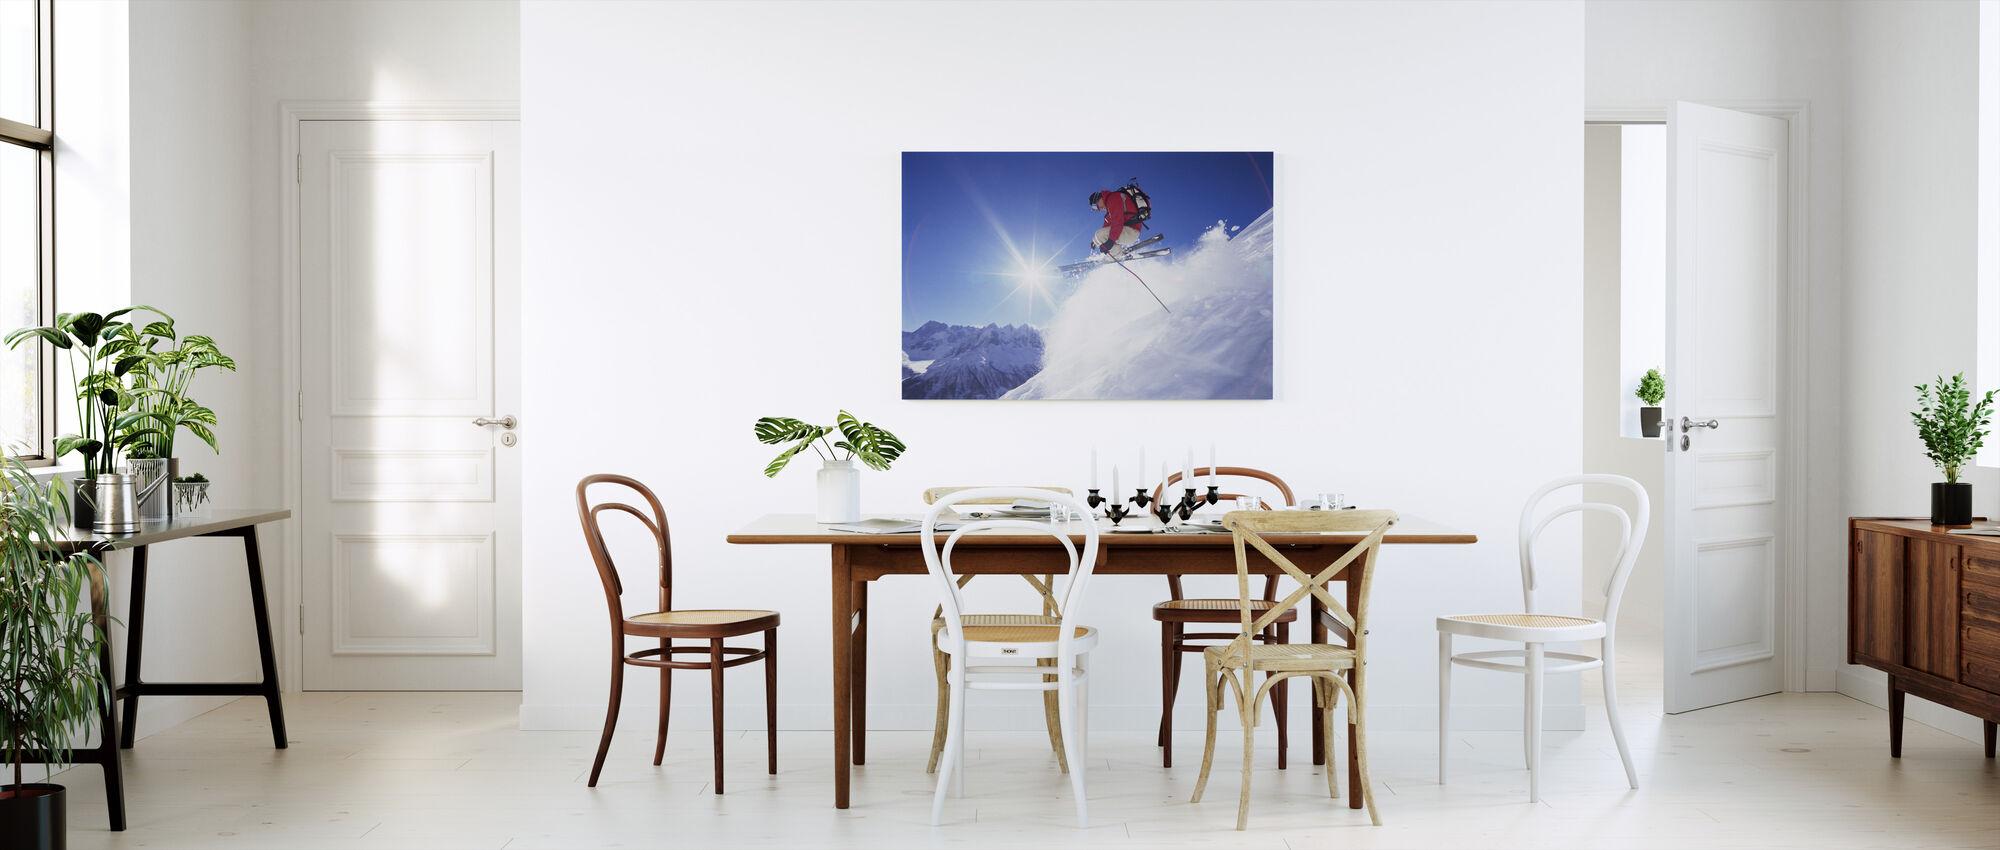 Adrenaline Skiing - Canvas print - Kitchen